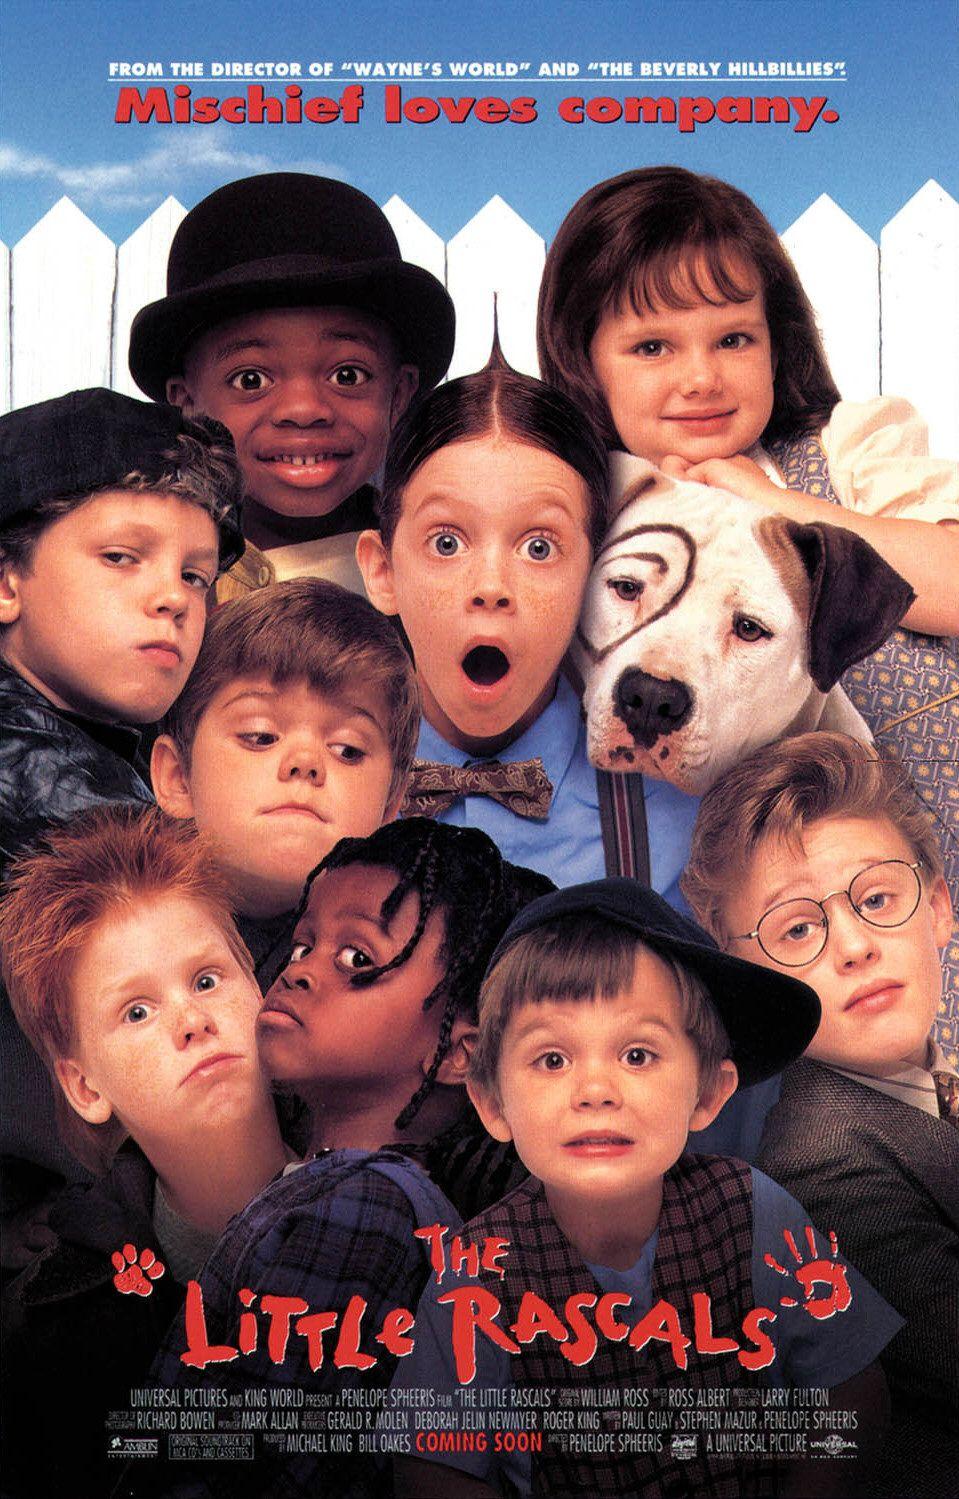 The Little Rascals (film)